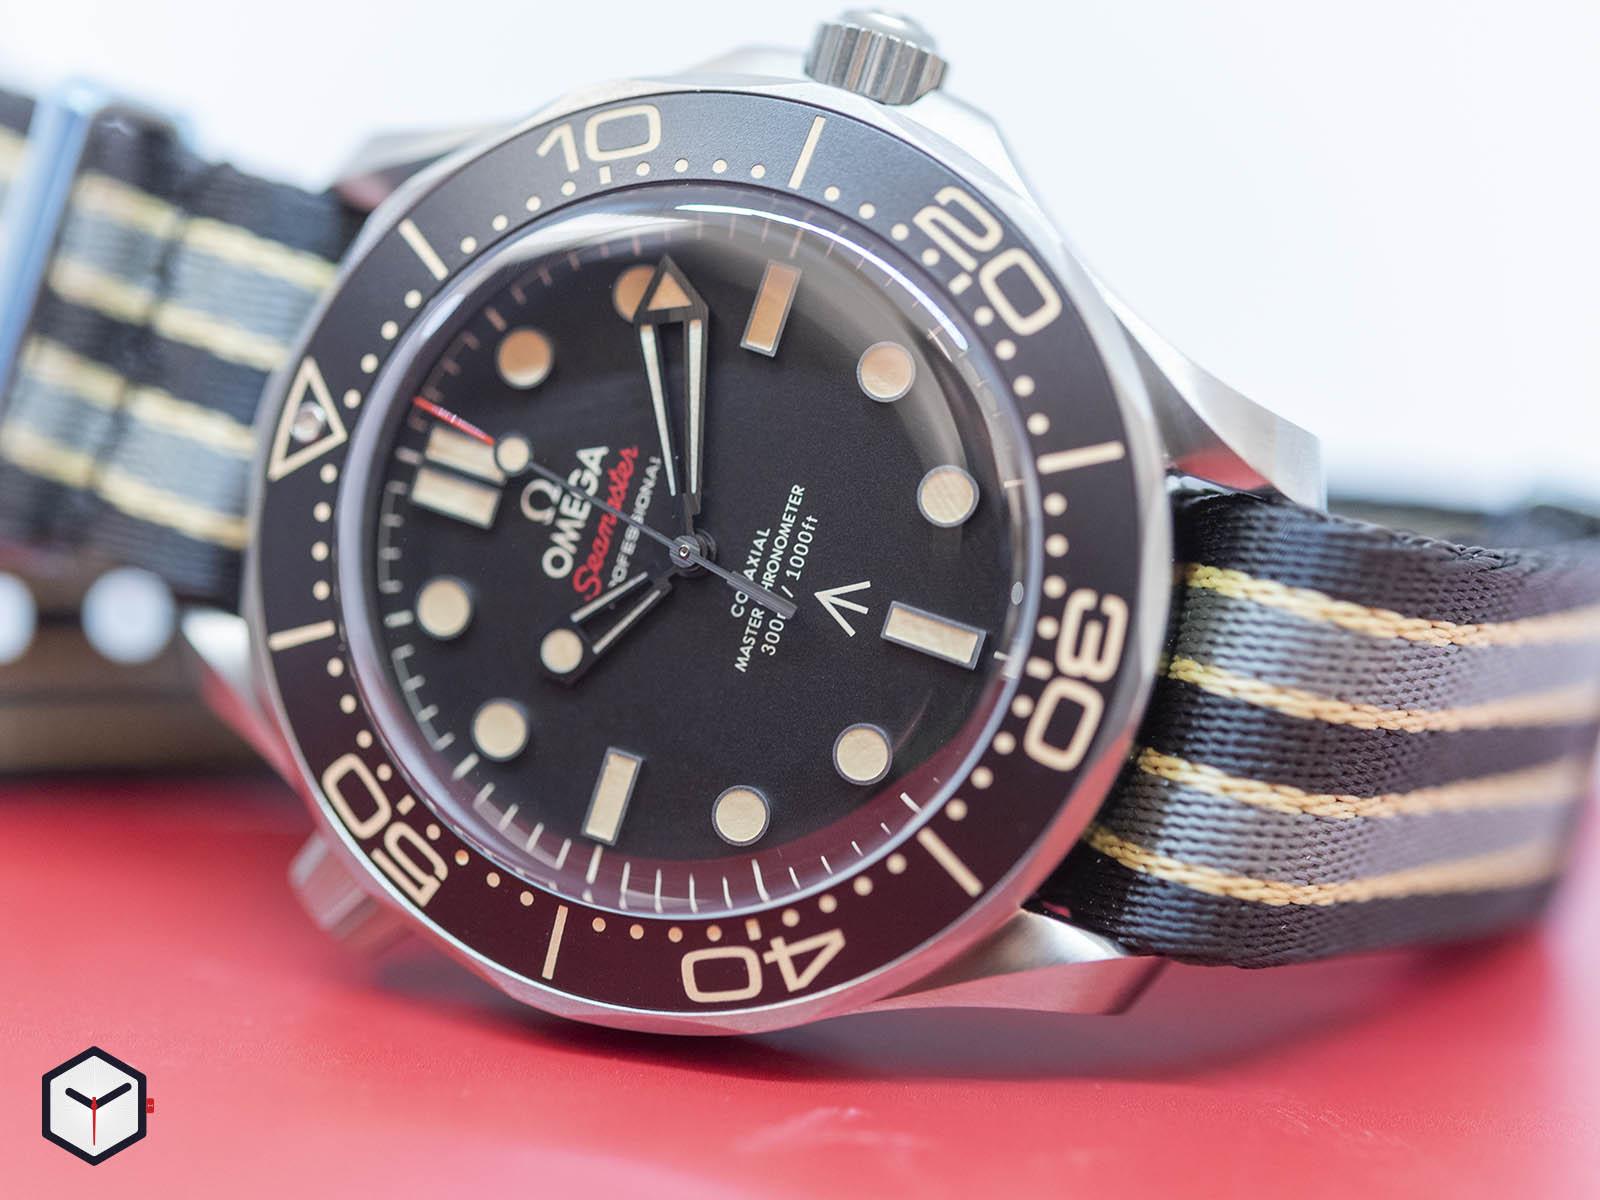 210-92-42-20-01-001-omega-seamaster-diver-300m-007-edition-2.jpg